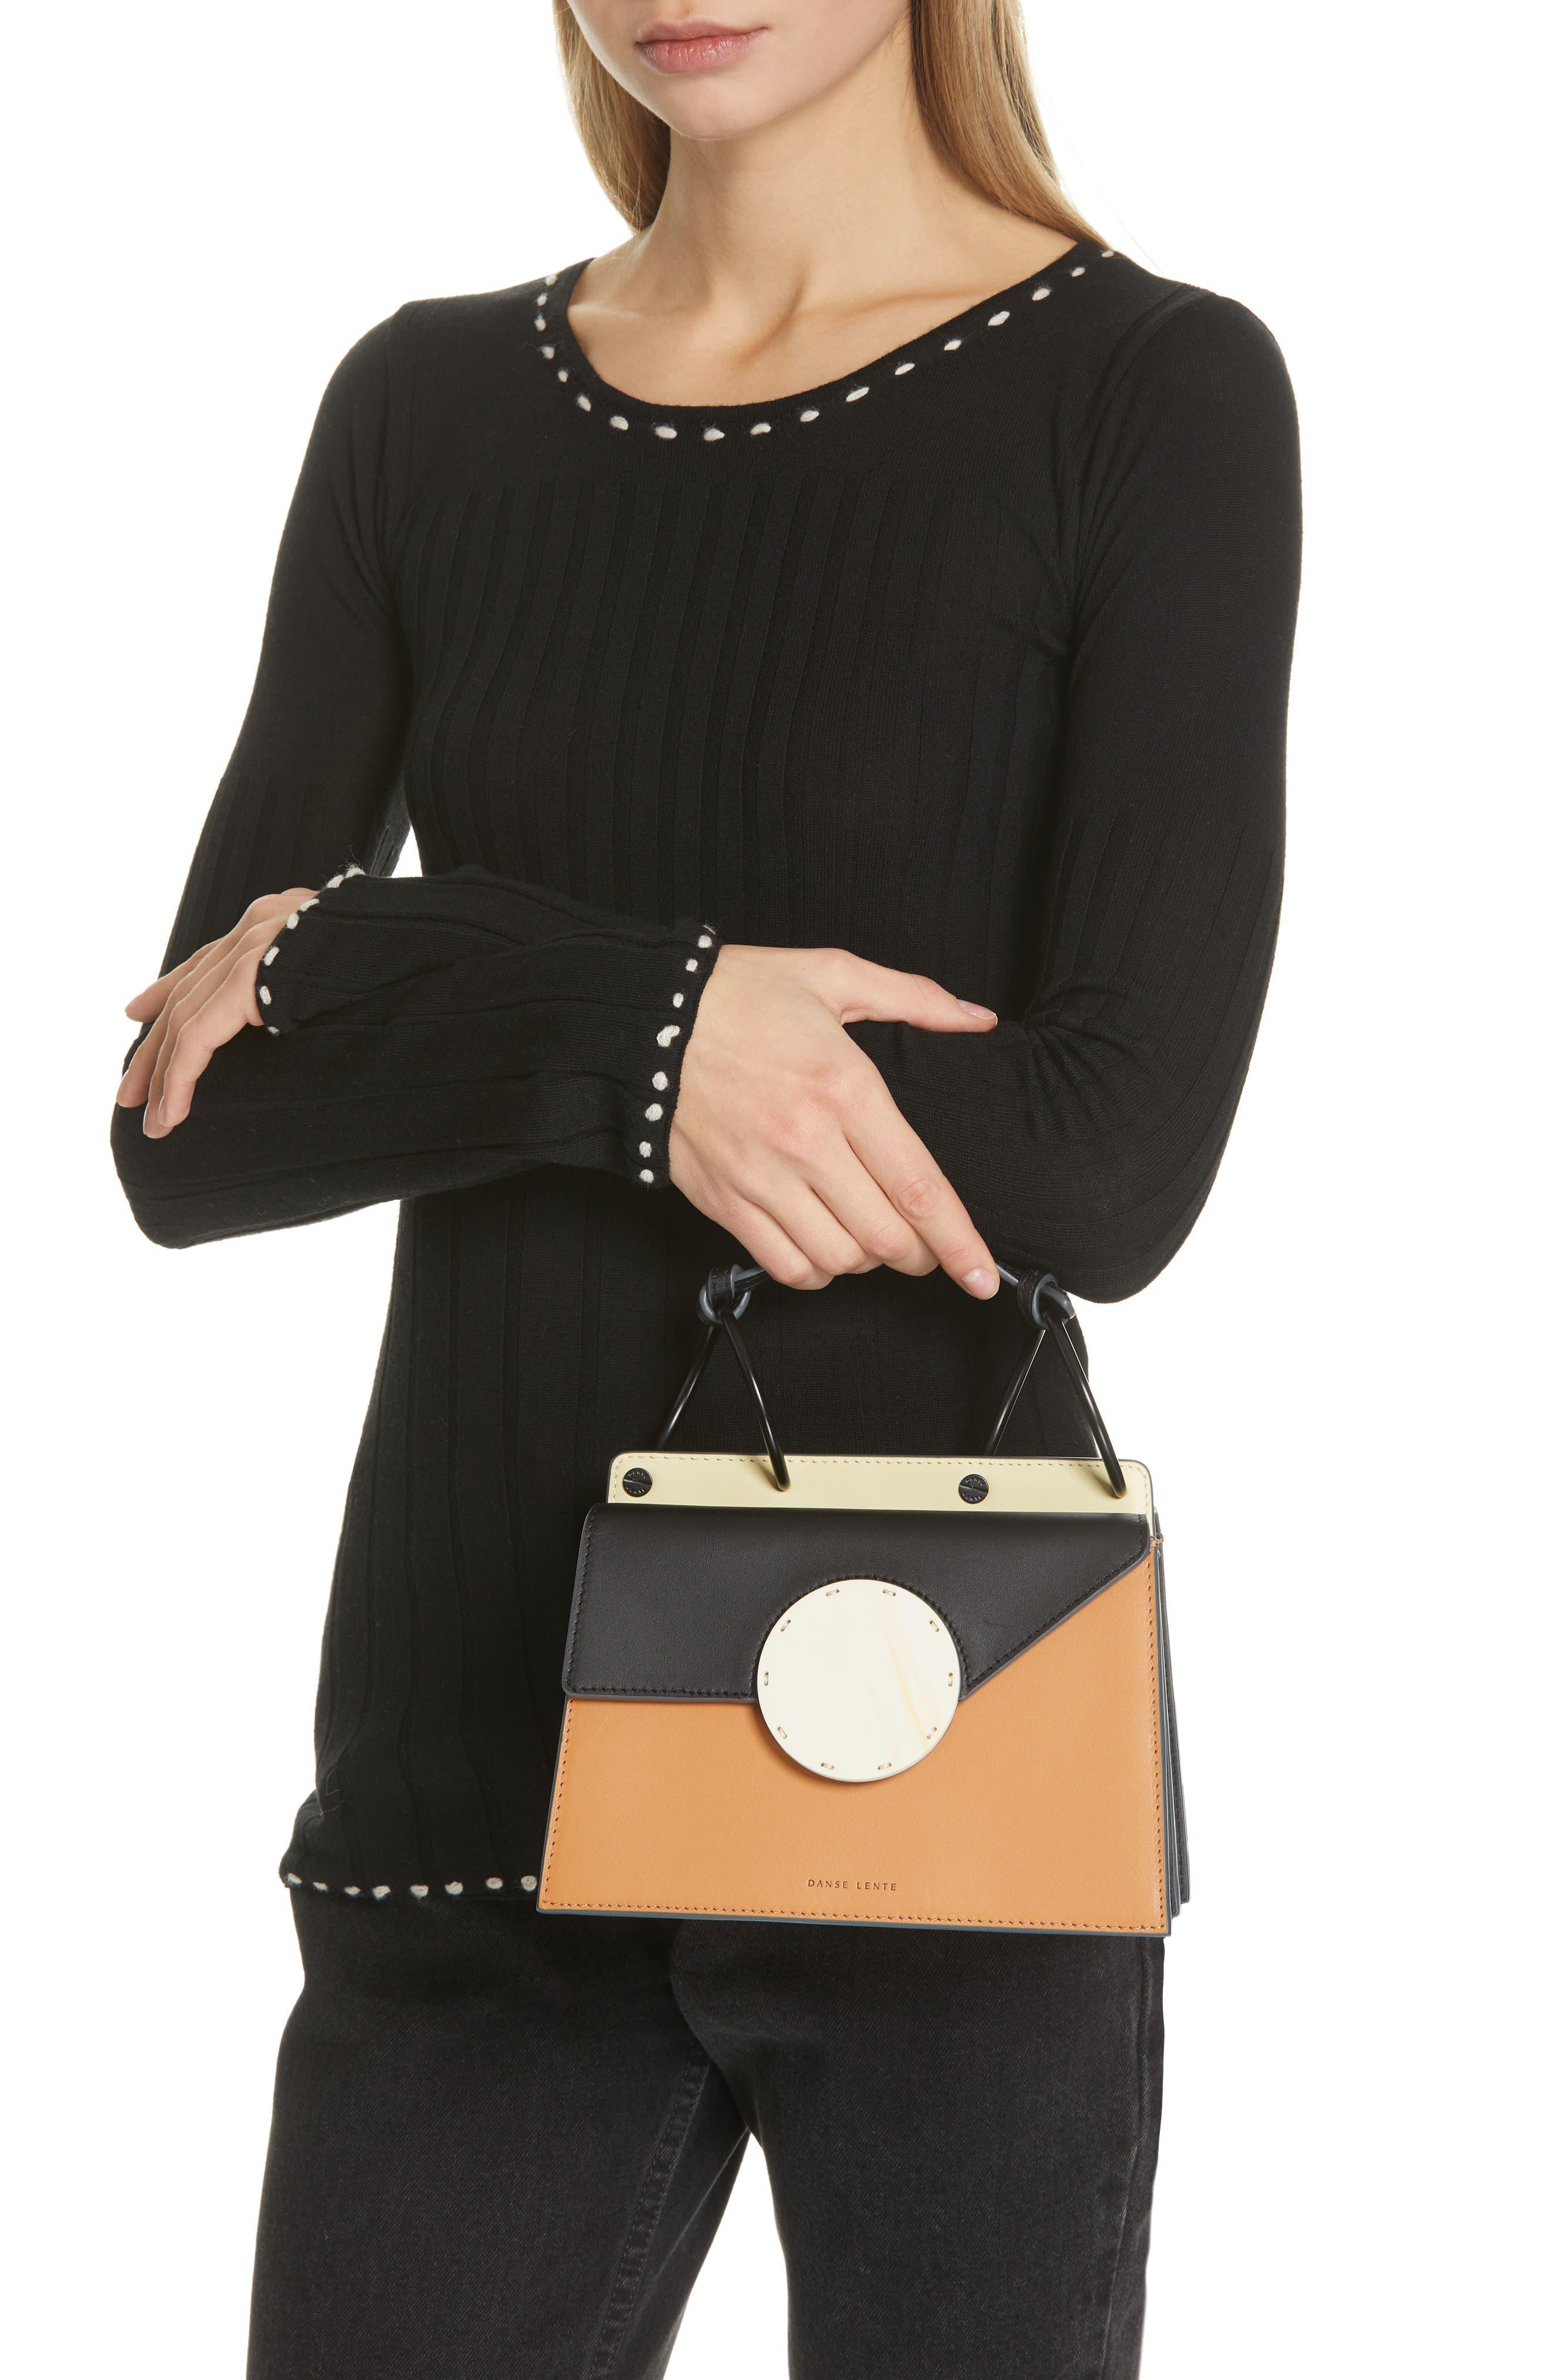 DANSE LENTE, Phoebe Bis Acetate Closure Crossbody Bag, Alternate thumbnail 3, color, TOFFEE/ BLACK